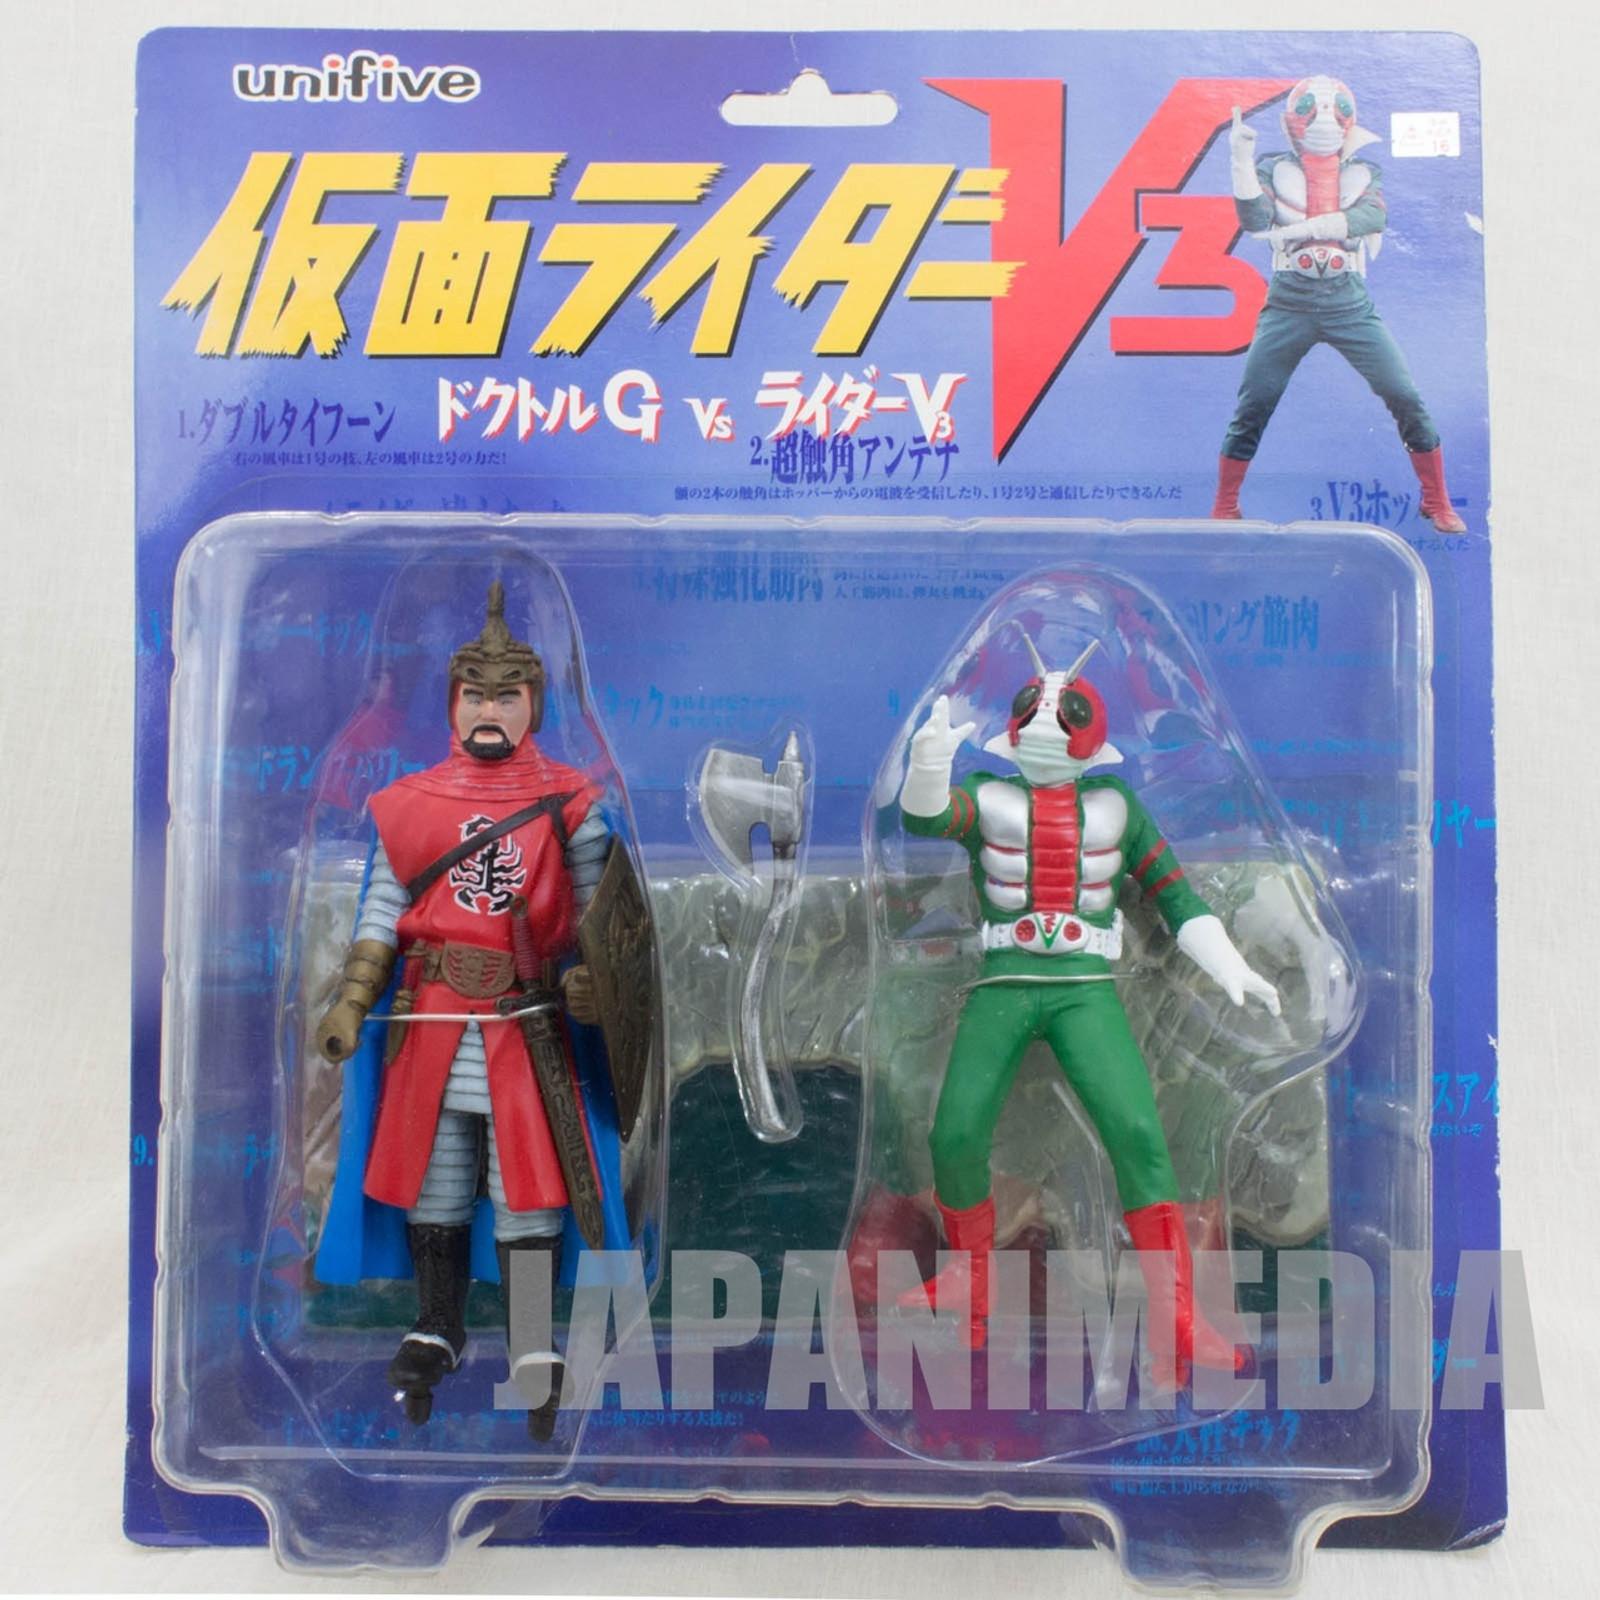 Kamen Rider V3 VS Doctor G Figure Unifive JAPAN ANIME